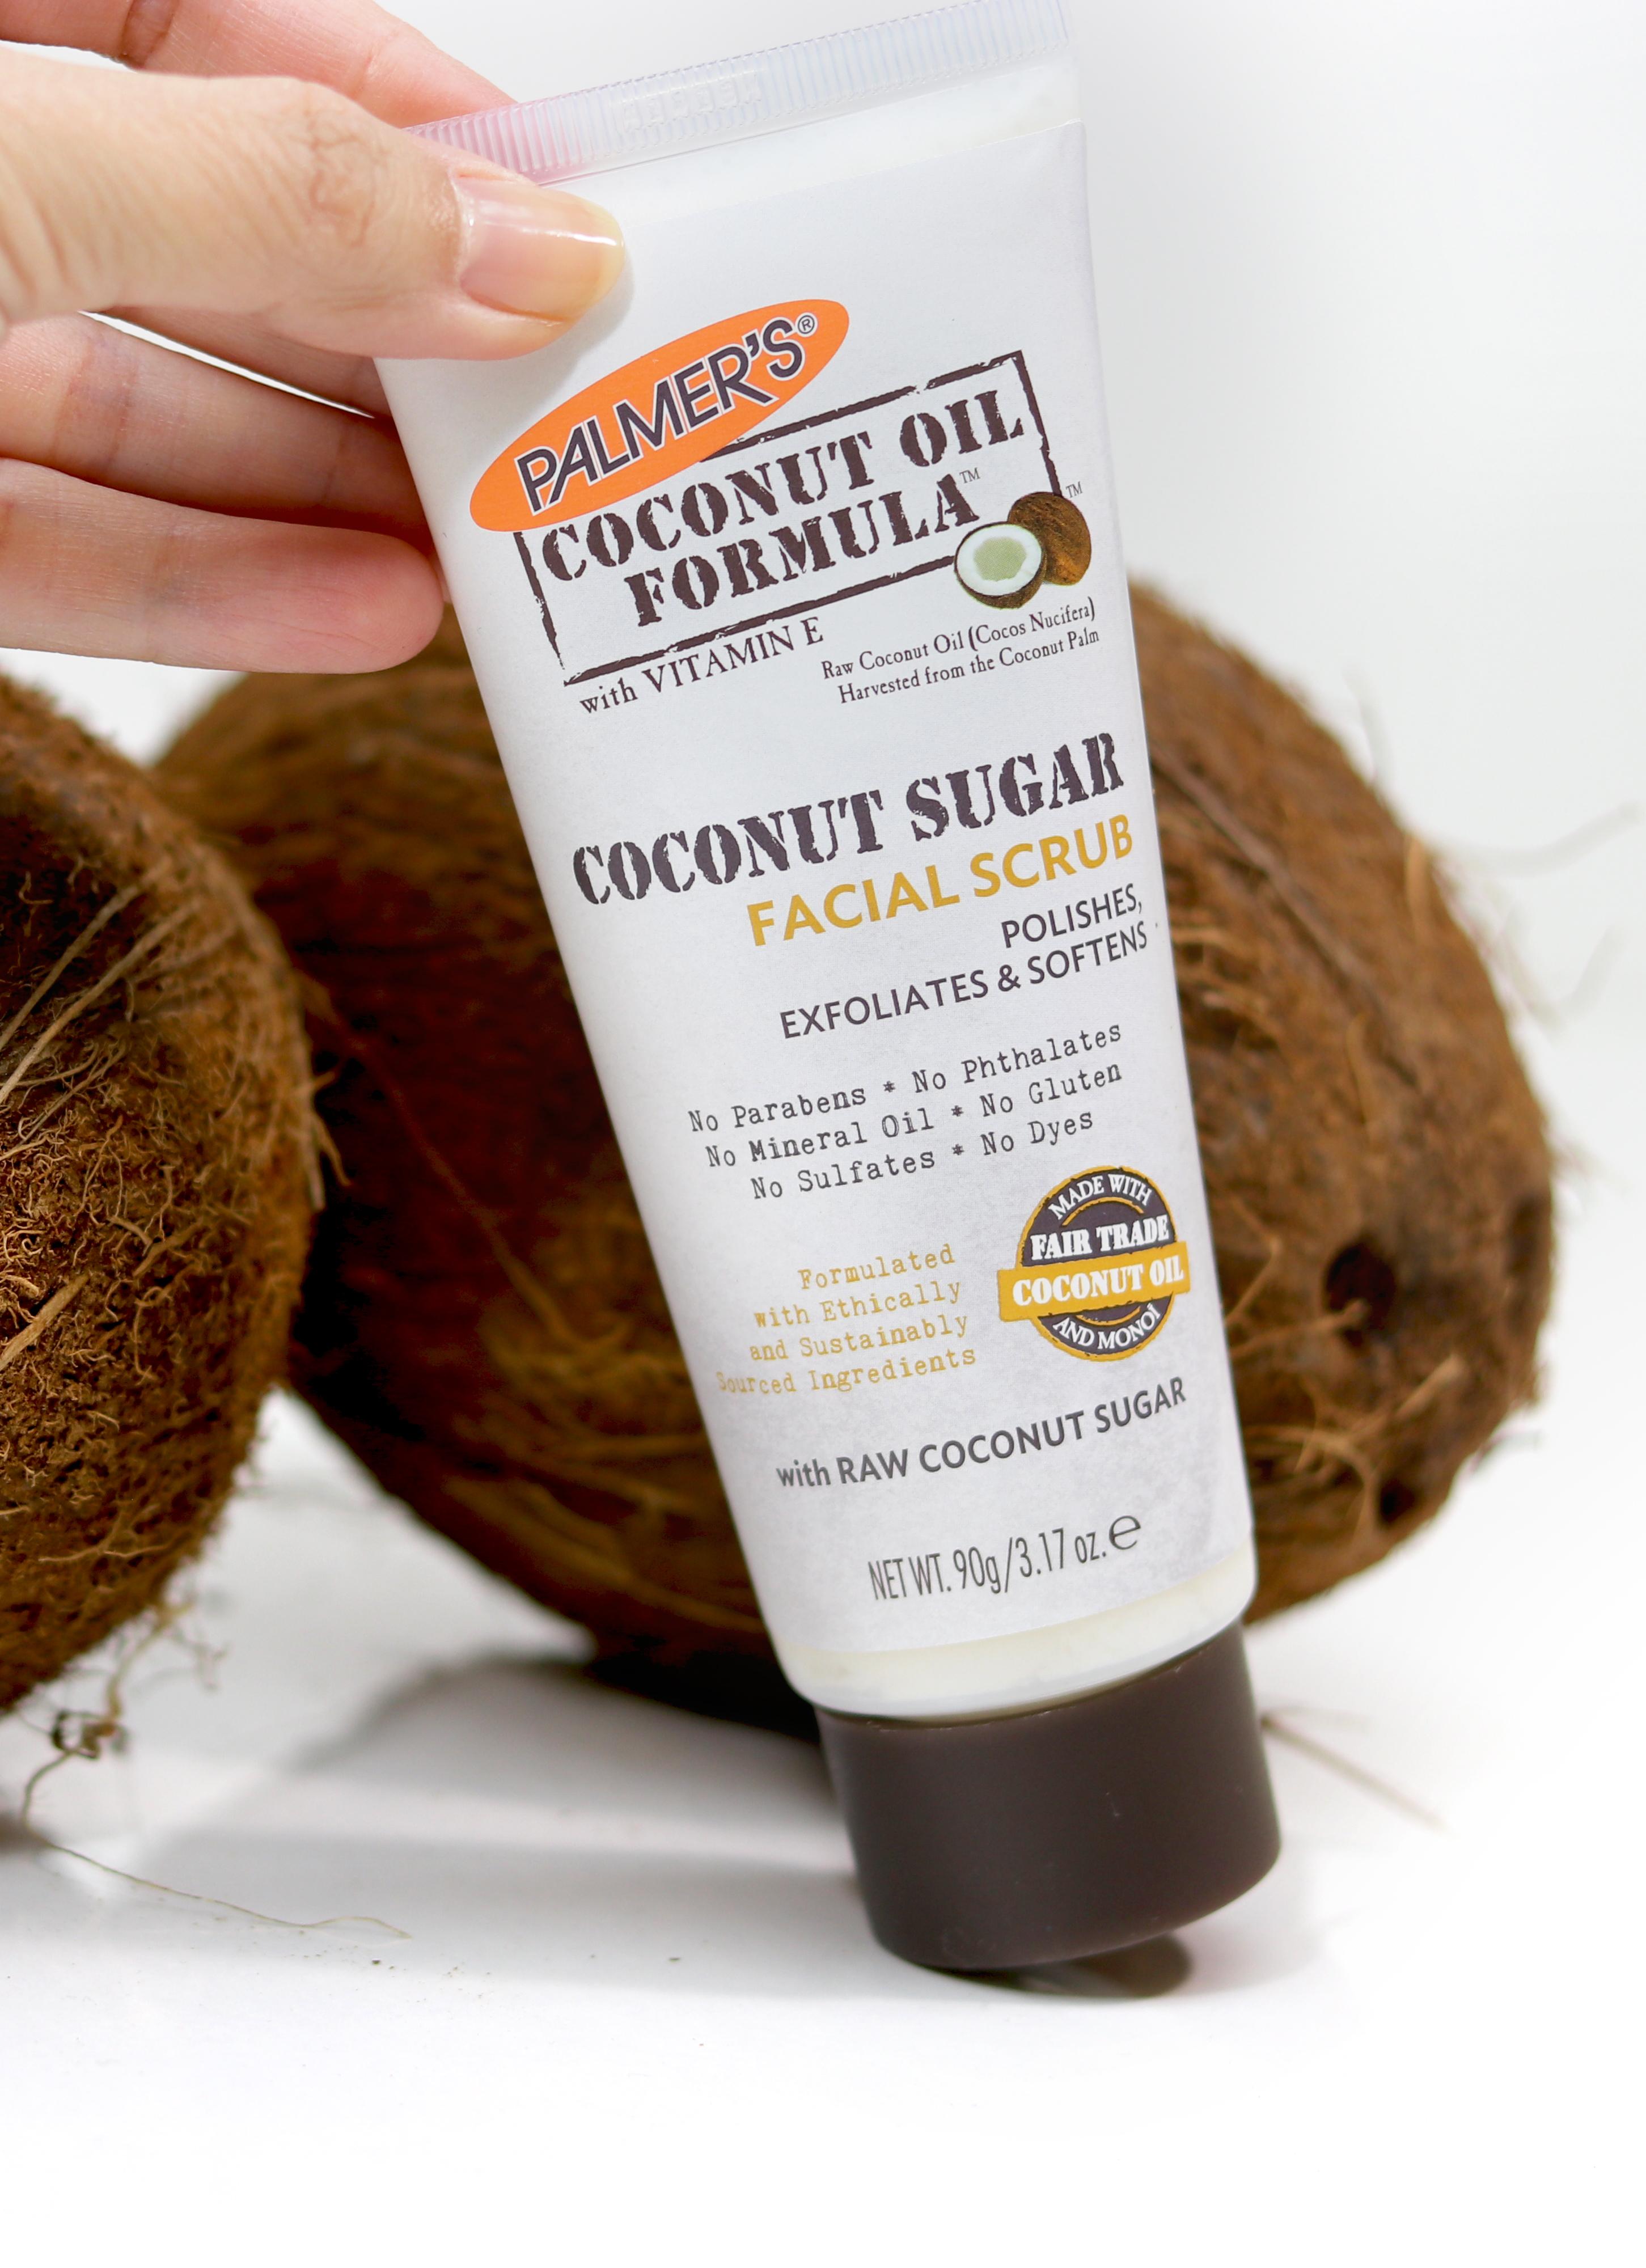 Palmer's Coconut Oil Formula Coconut Sugar Facial Scrub